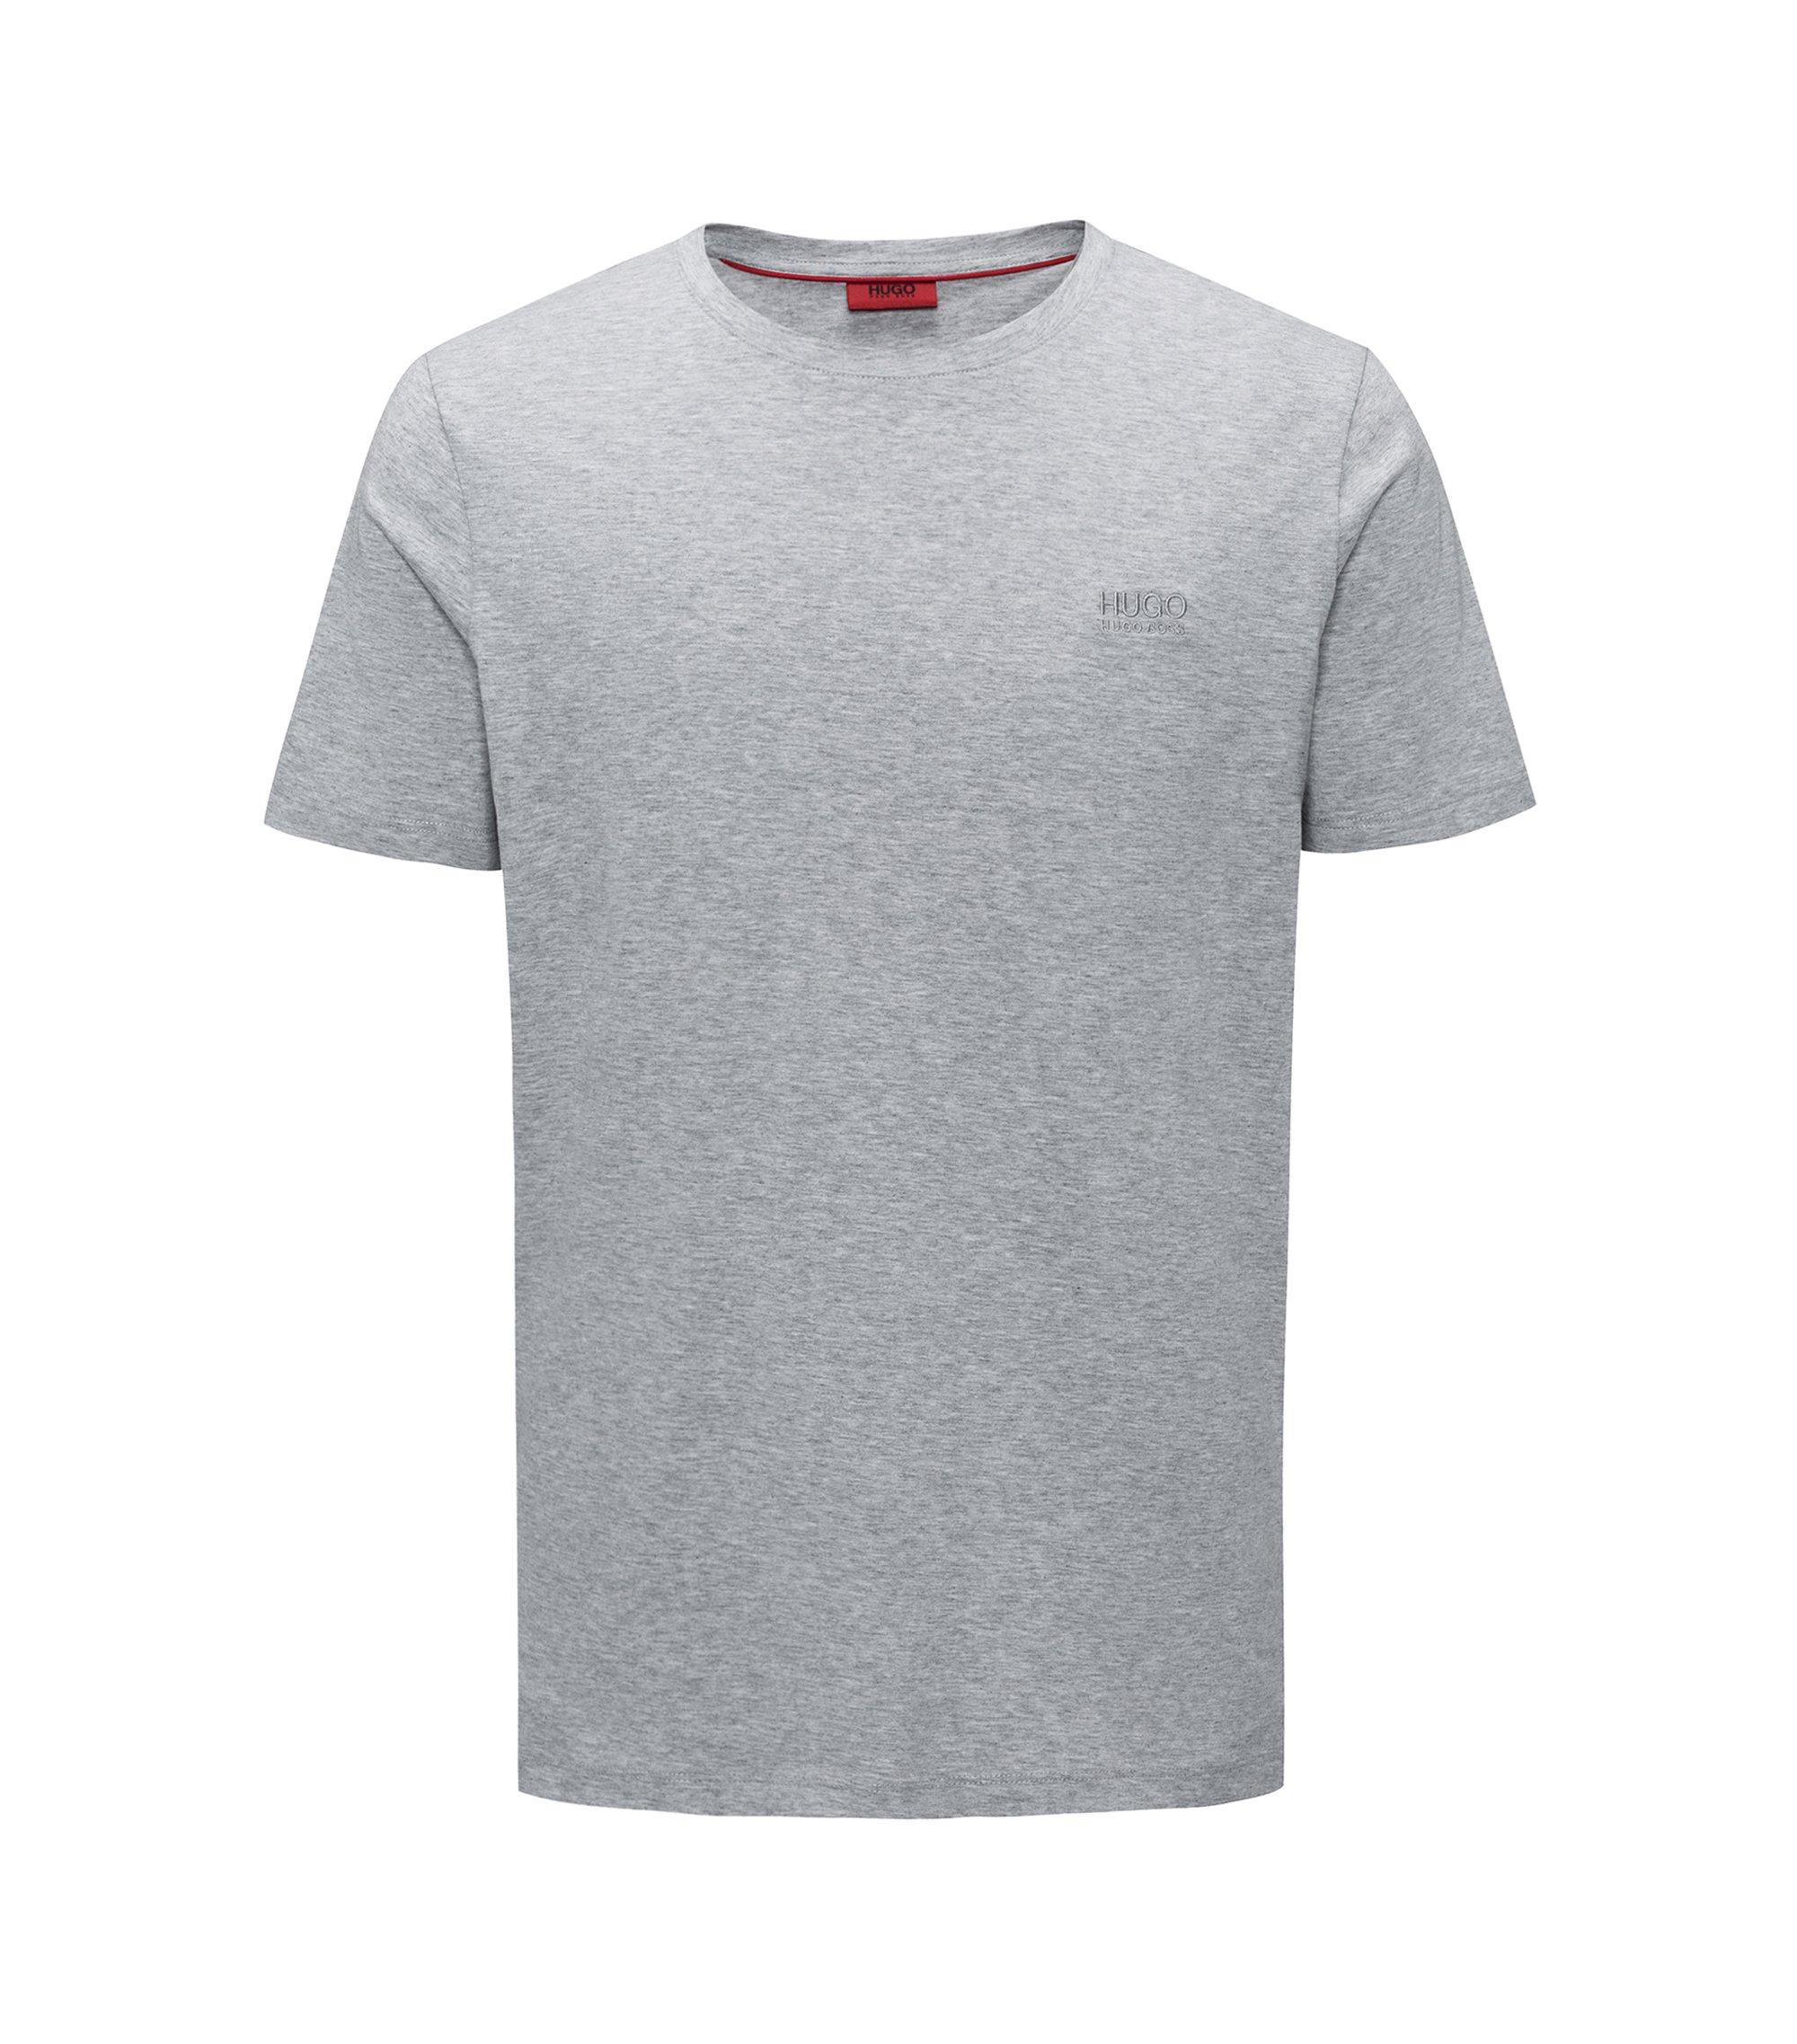 Camiseta regular fit con logo en algodón suave, Gris oscuro